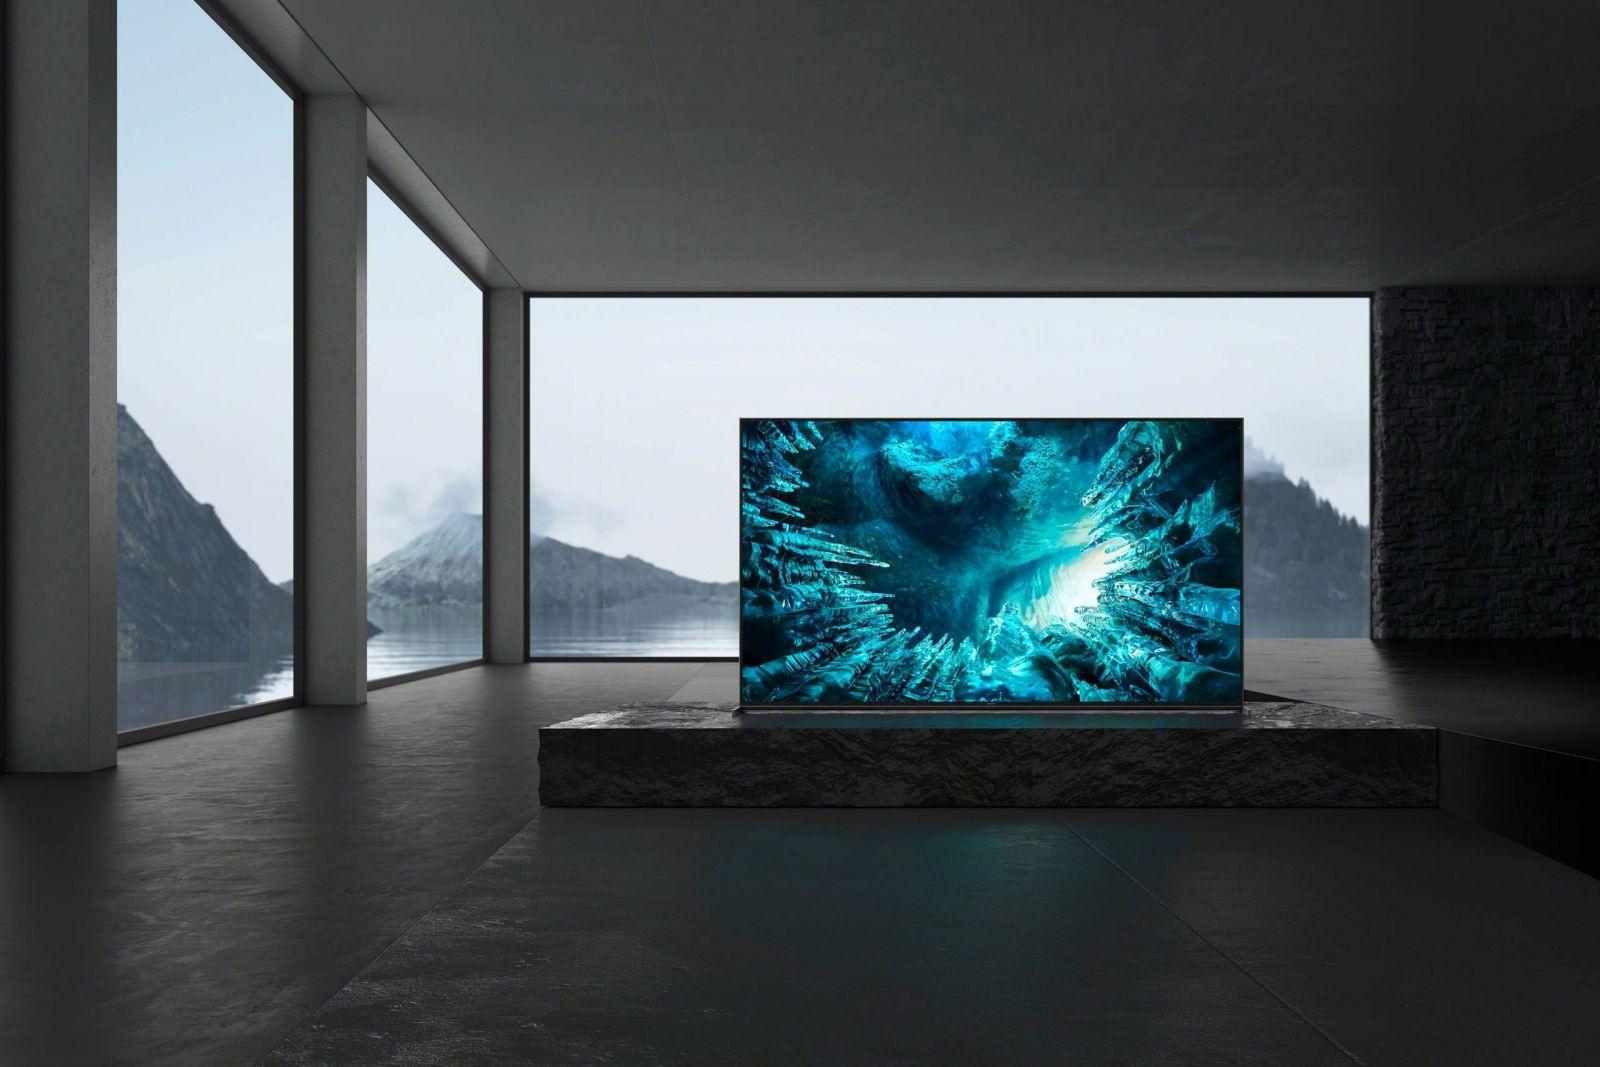 8K-телевизор Sony BRAVIA серии ZH8 с полной прямой подсветкой уже в продаже (in situation 85 z8h zh8 dark sil dark sil edge large scaled)